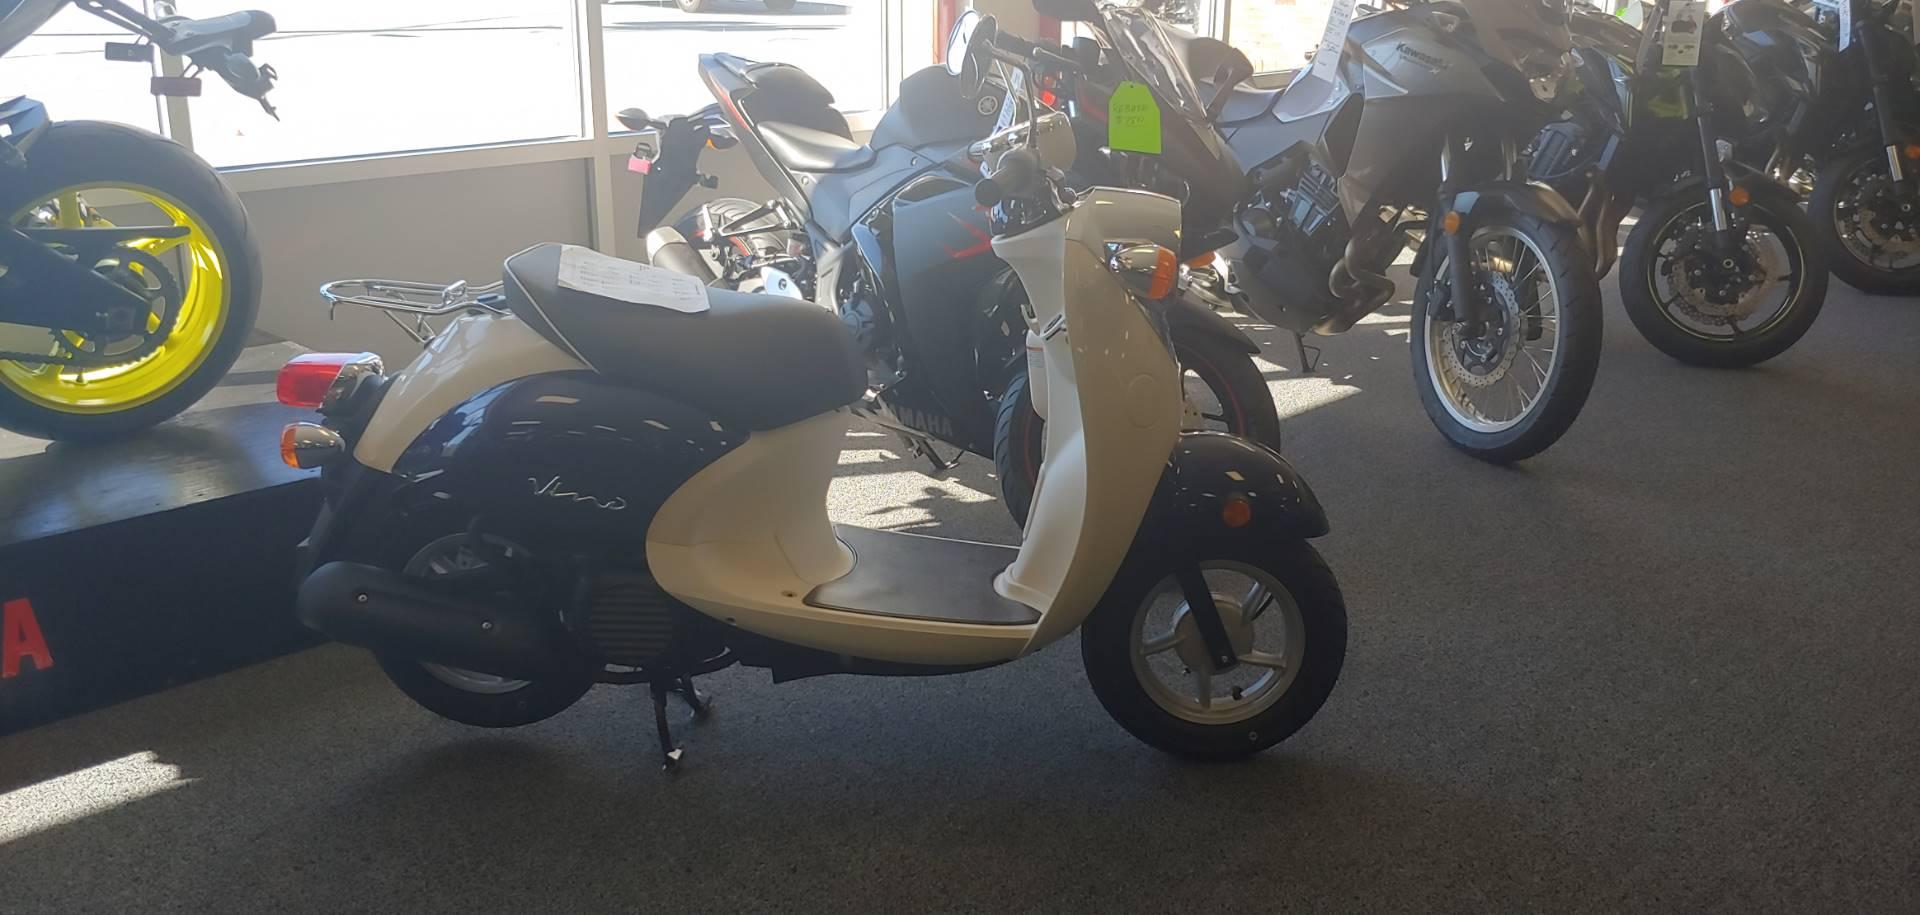 2018 Yamaha Vino Classic for sale 4455